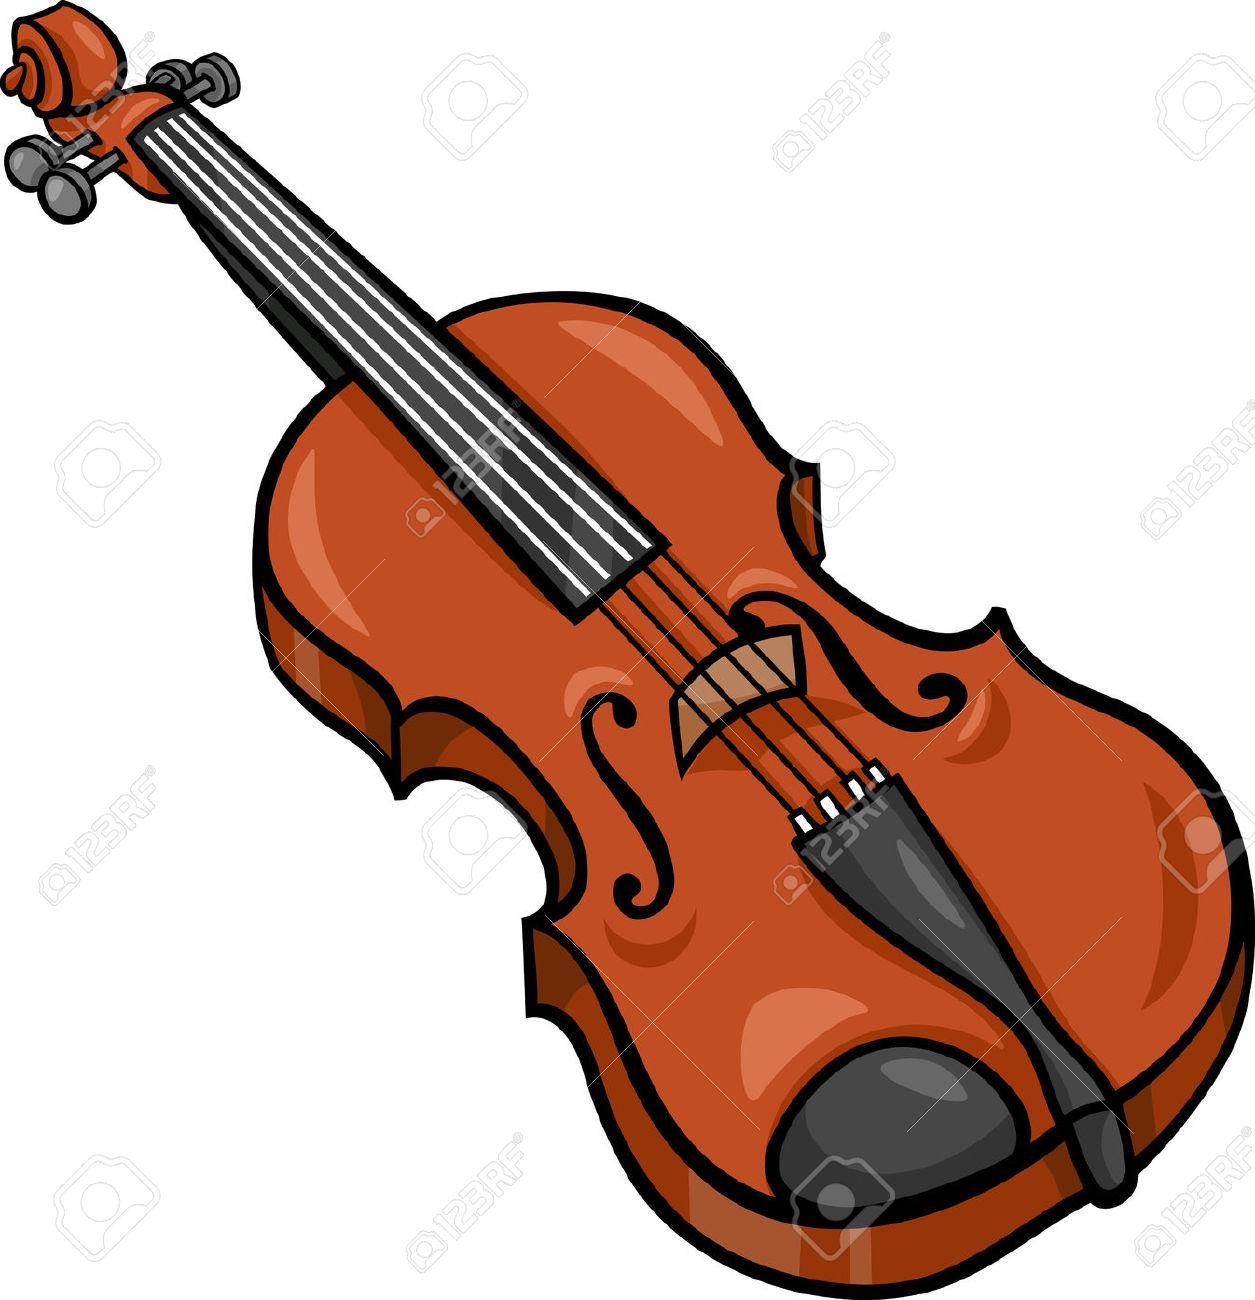 Violin pictures clip art transparent 9,523 Violin Stock Illustrations, Cliparts And Royalty Free Violin ... transparent